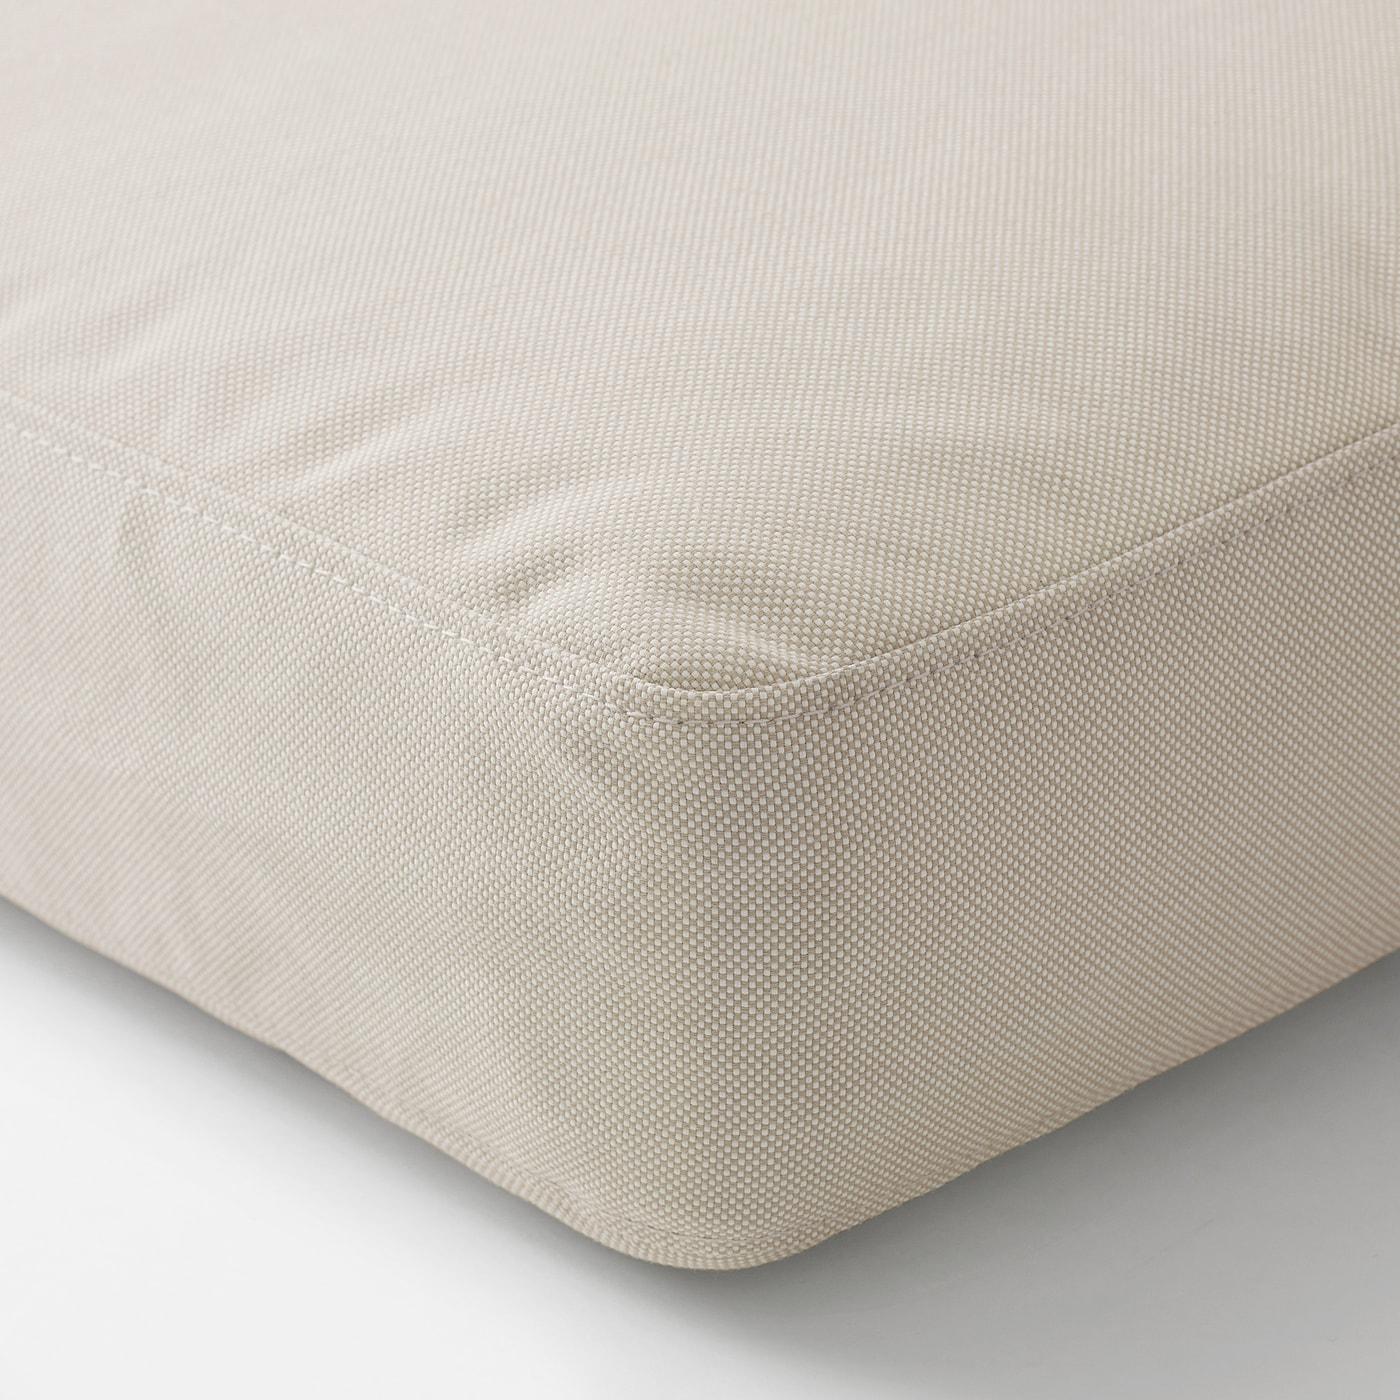 FRÖSÖN/DUVHOLMEN Seat cushion, outdoor - beige 9x9 cm